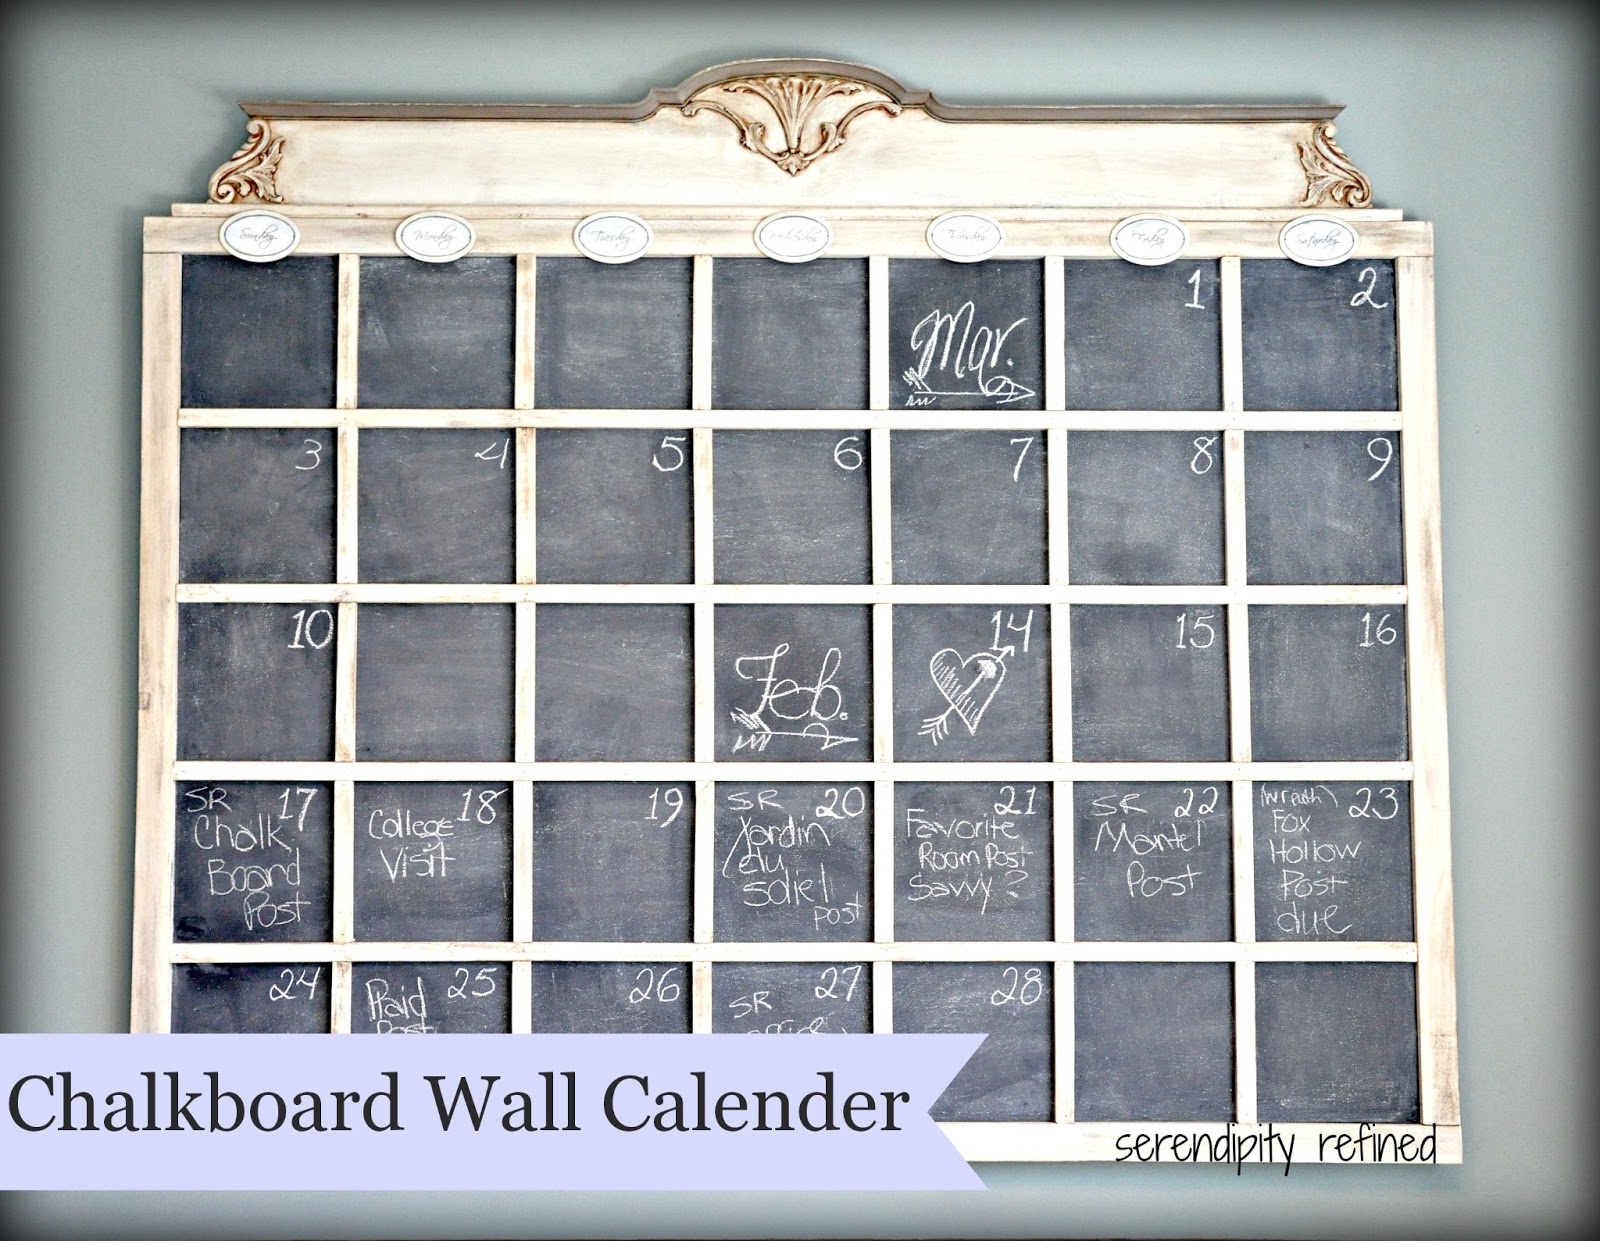 Chalkboard Calendar Wall : Serendipity refined diy chalkboard wall calender